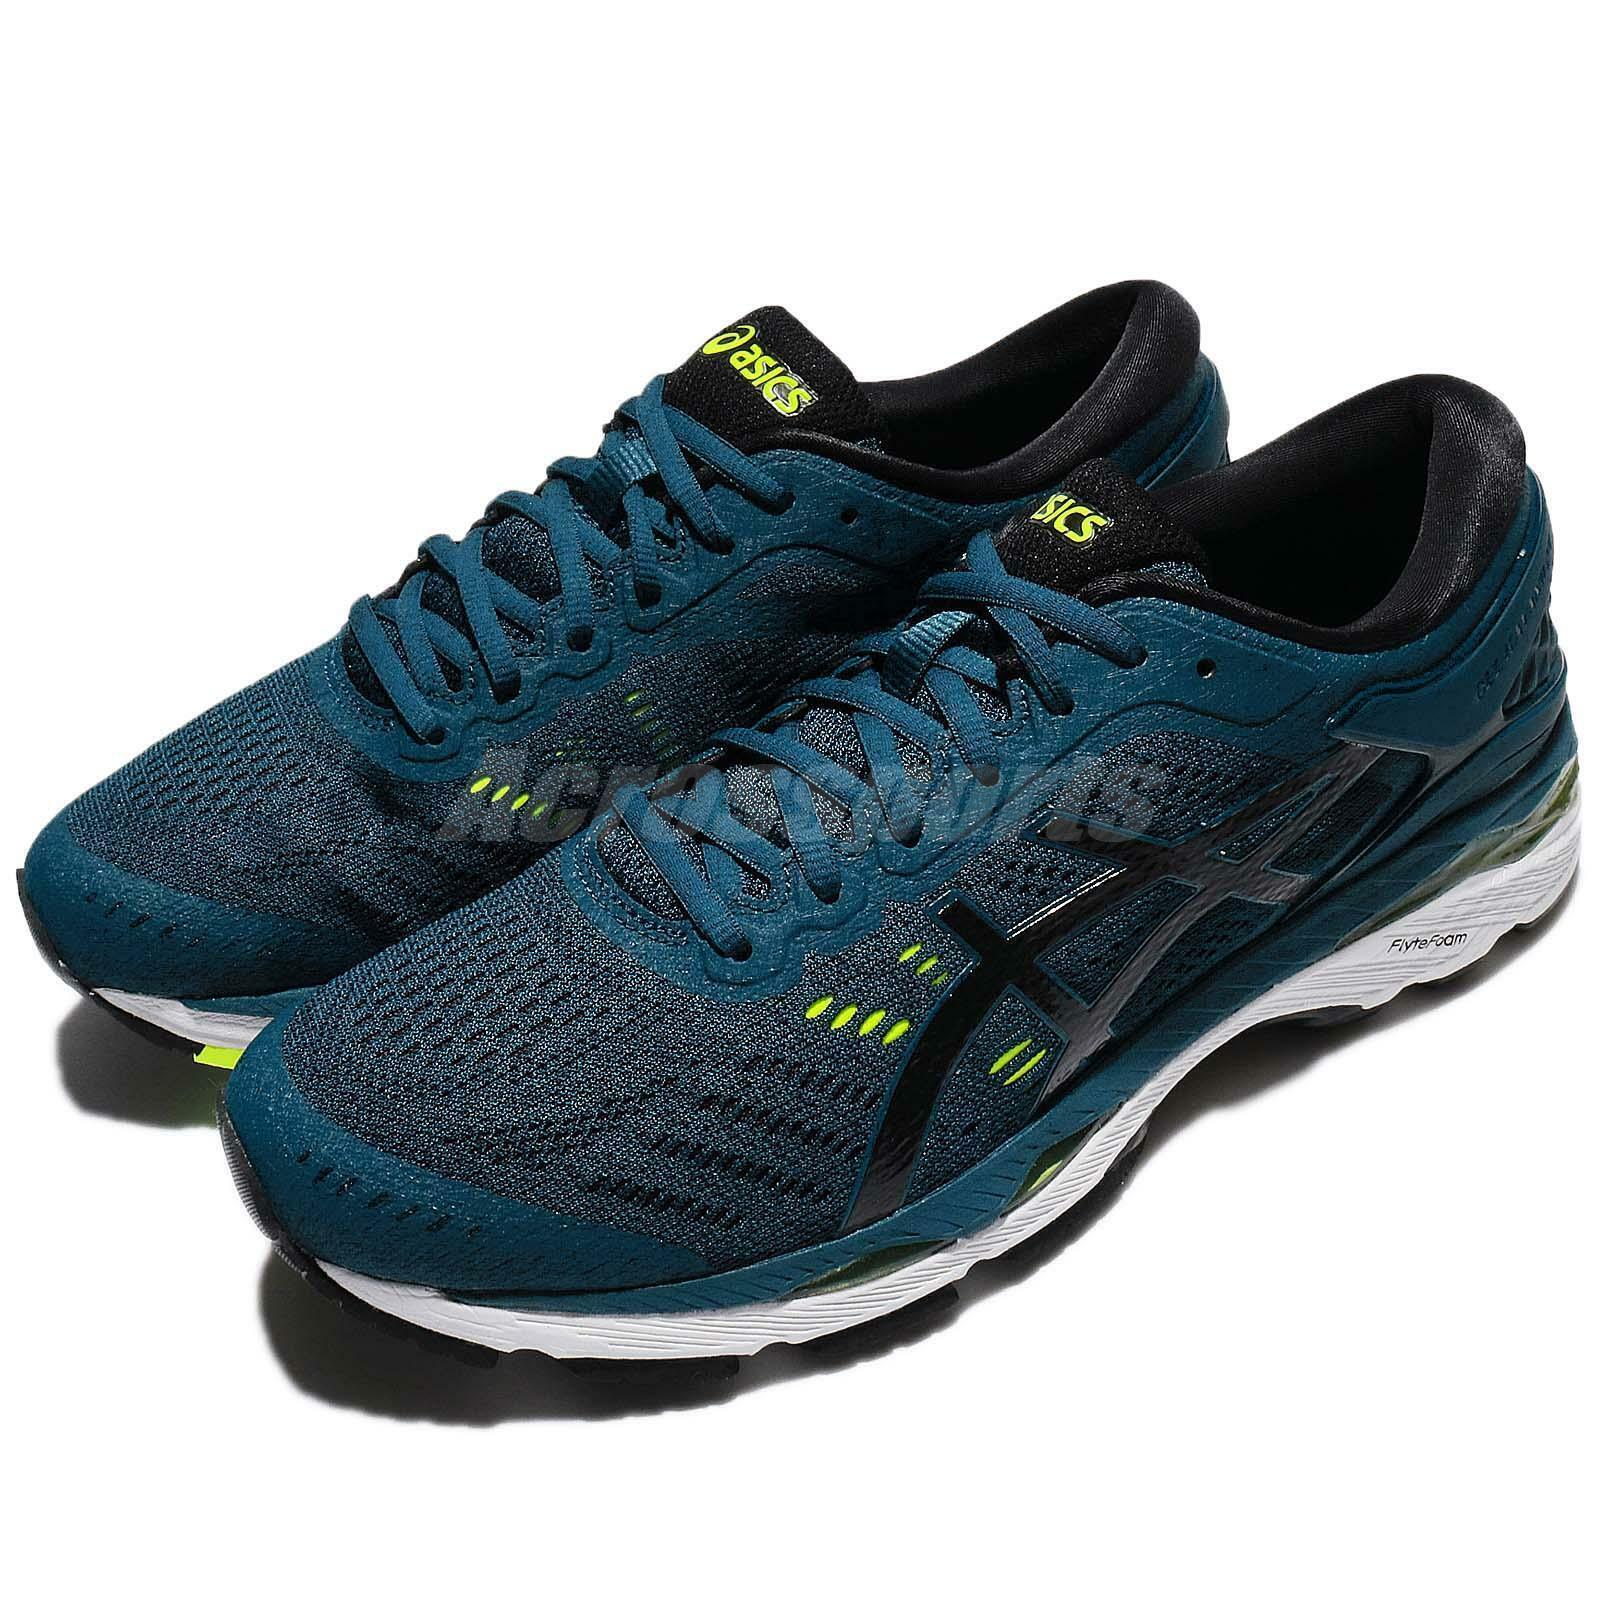 Asics Gel-Kayano 24 Ink azul negro amarillo Men Running zapatos zapatillas T749N-4590